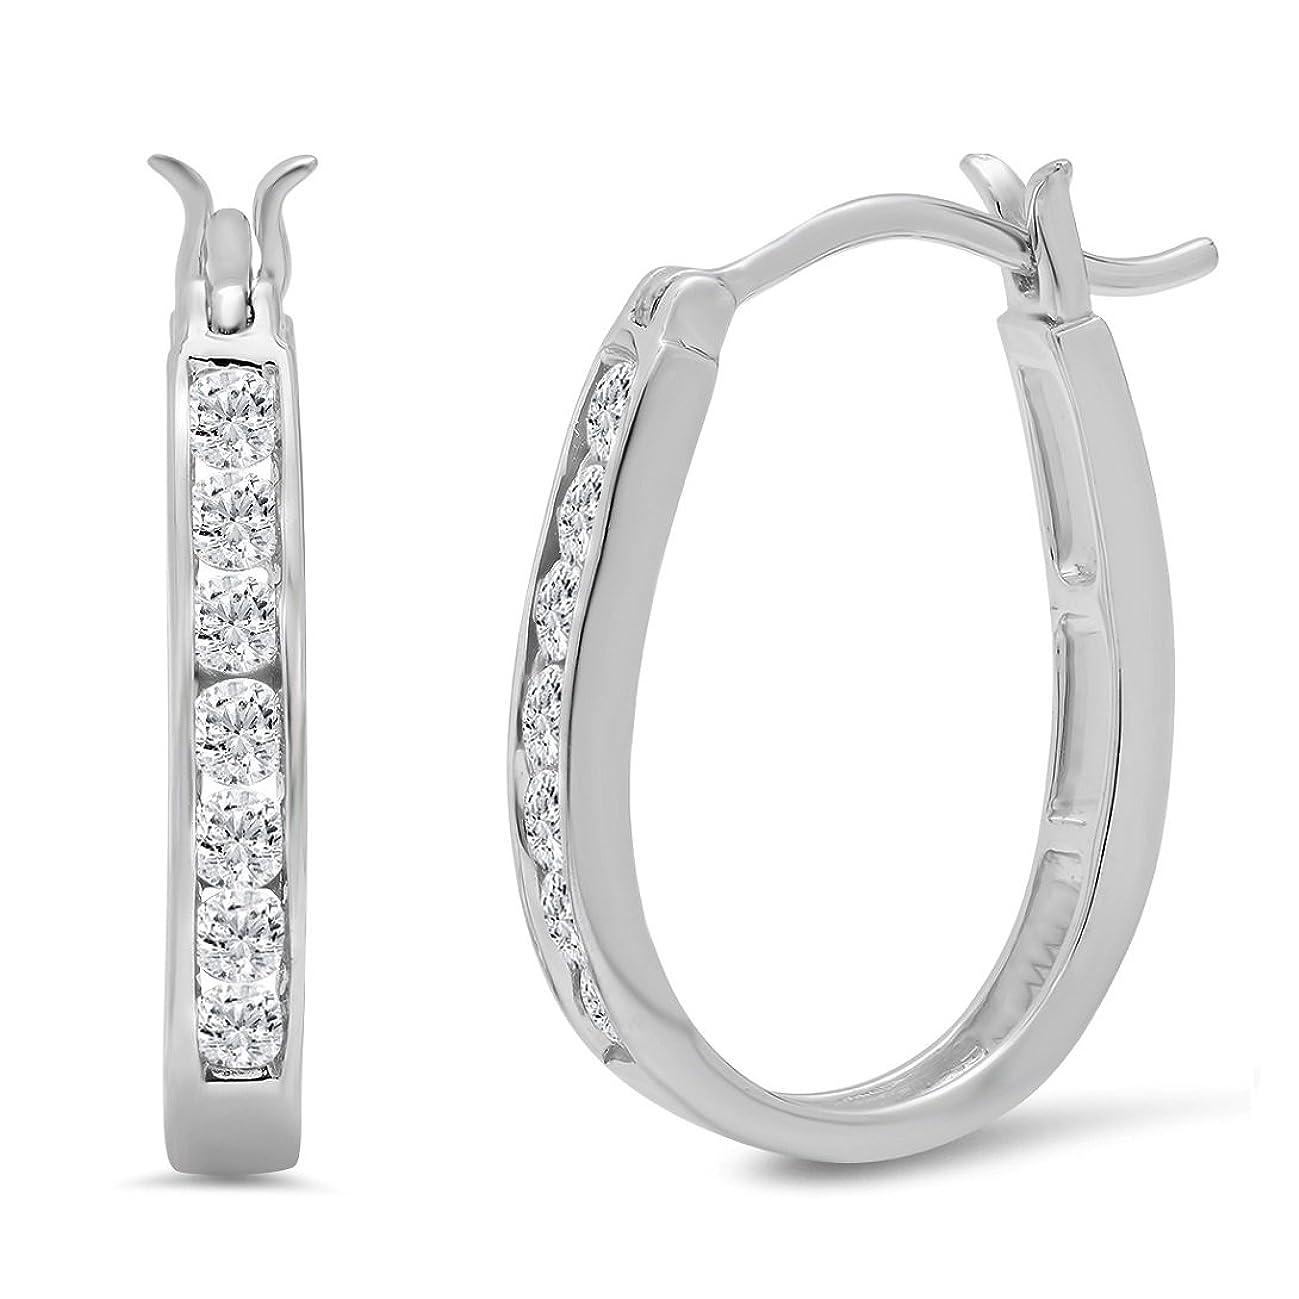 AGS Certified 1/2ct TW Diamond Hoop Earrings in 10K Gold